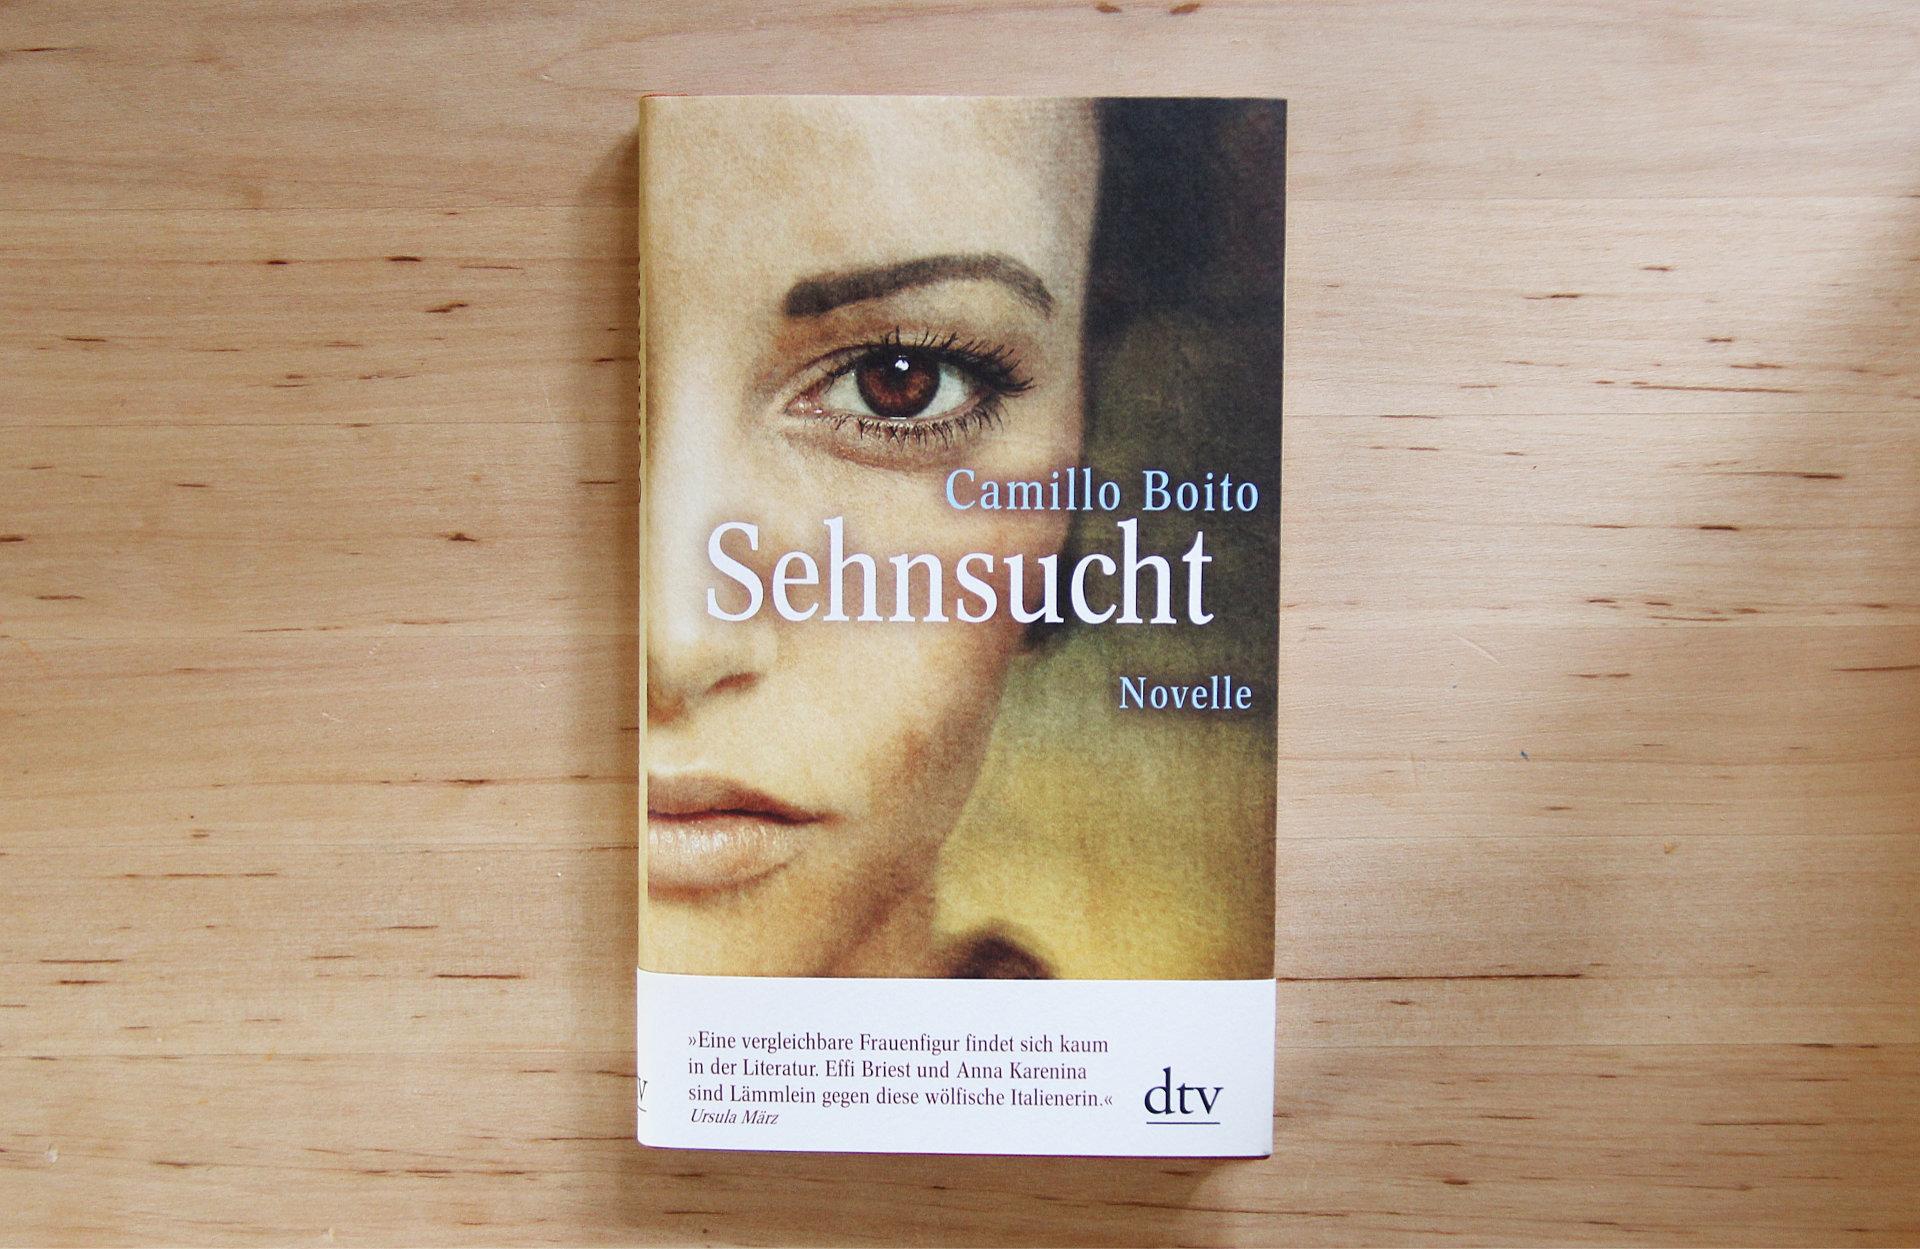 Sehnsucht: Das geheime Tagebuch der Contessa Livia • Camillo Boito